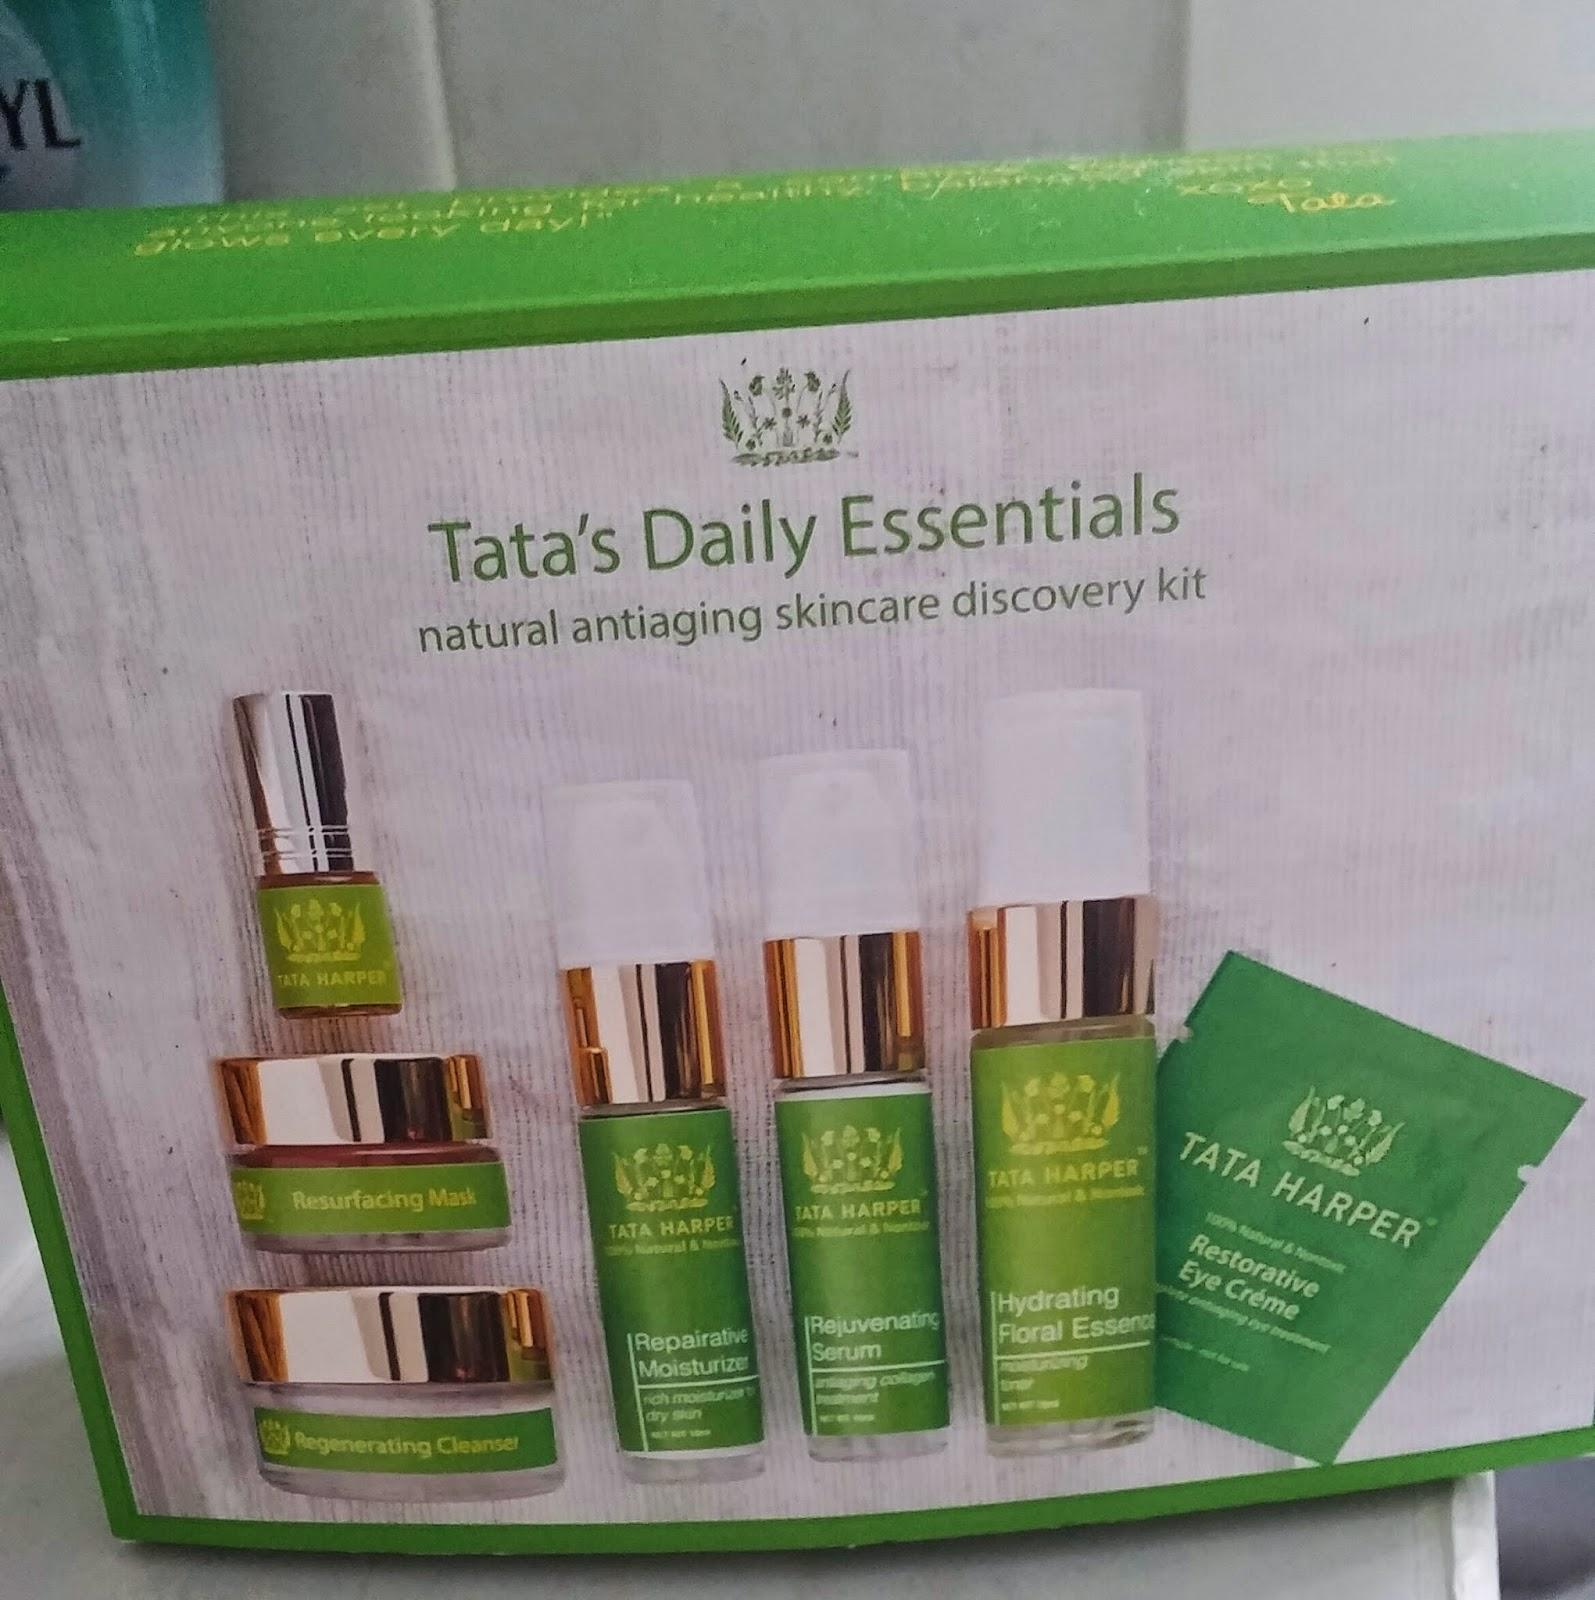 Tata's Daily Essentials by tata harper #3